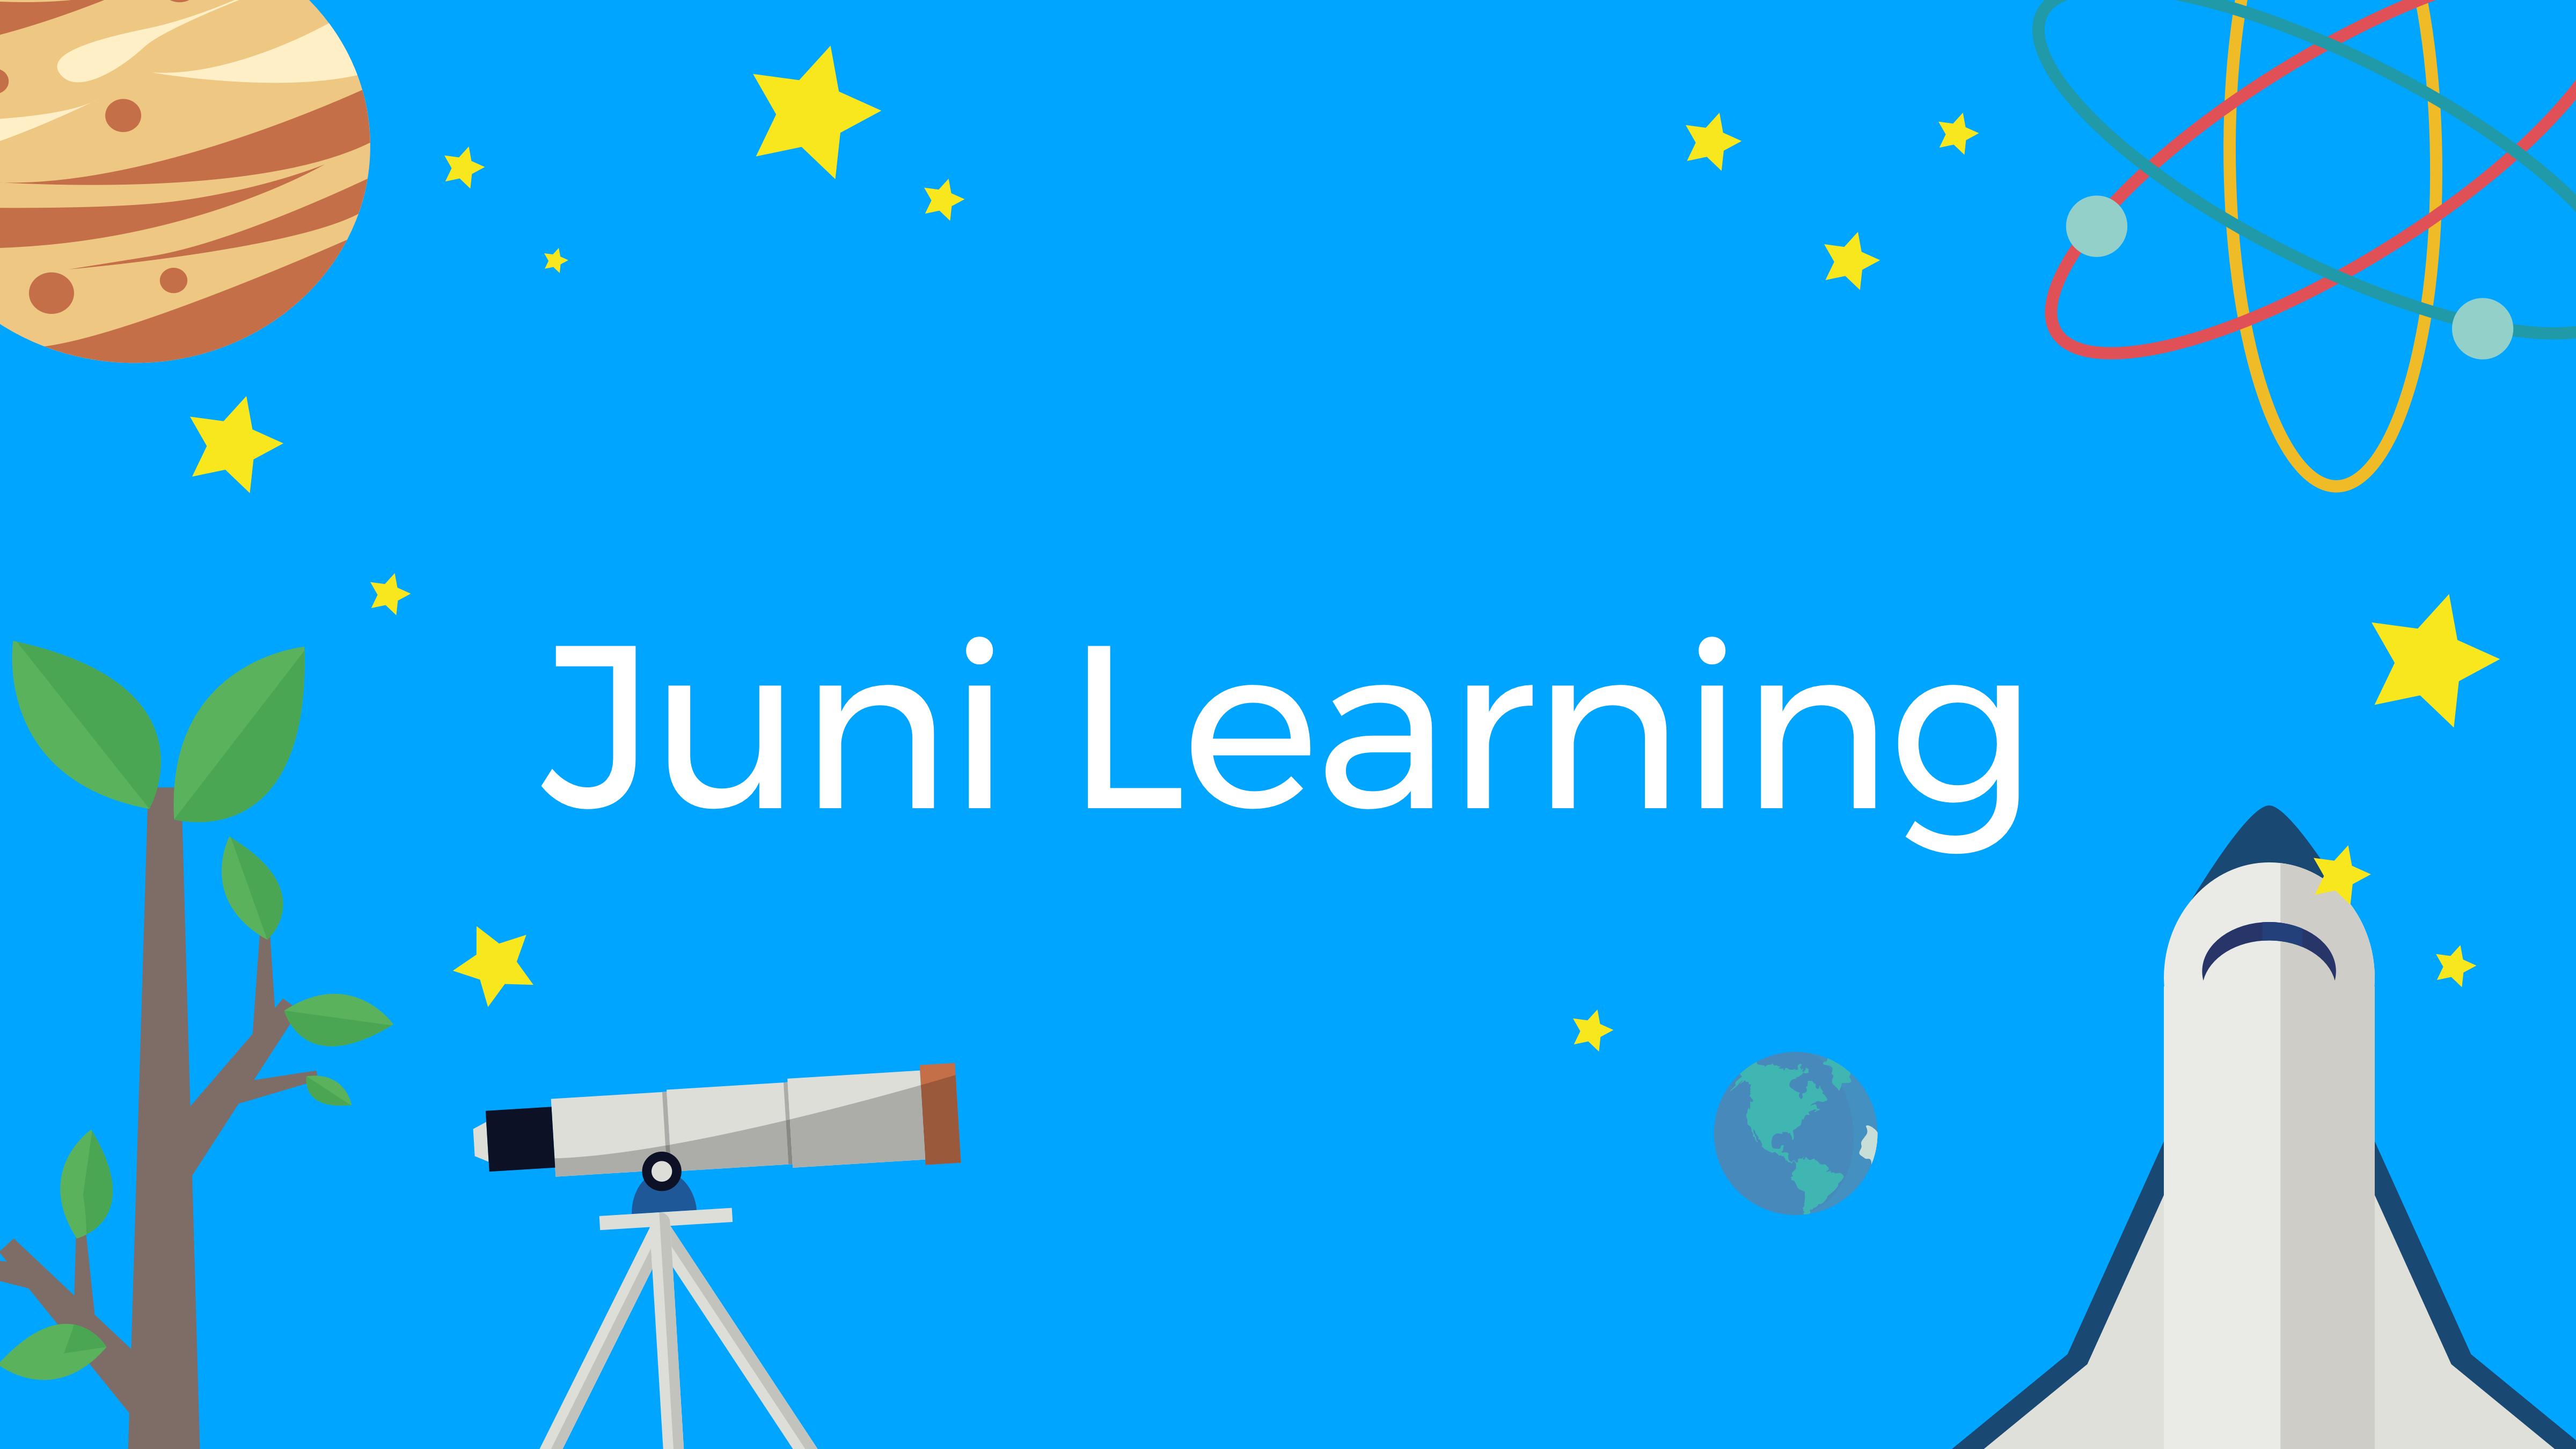 Juni Learning Online Coding Classes For Kids At Home Bostontechmom